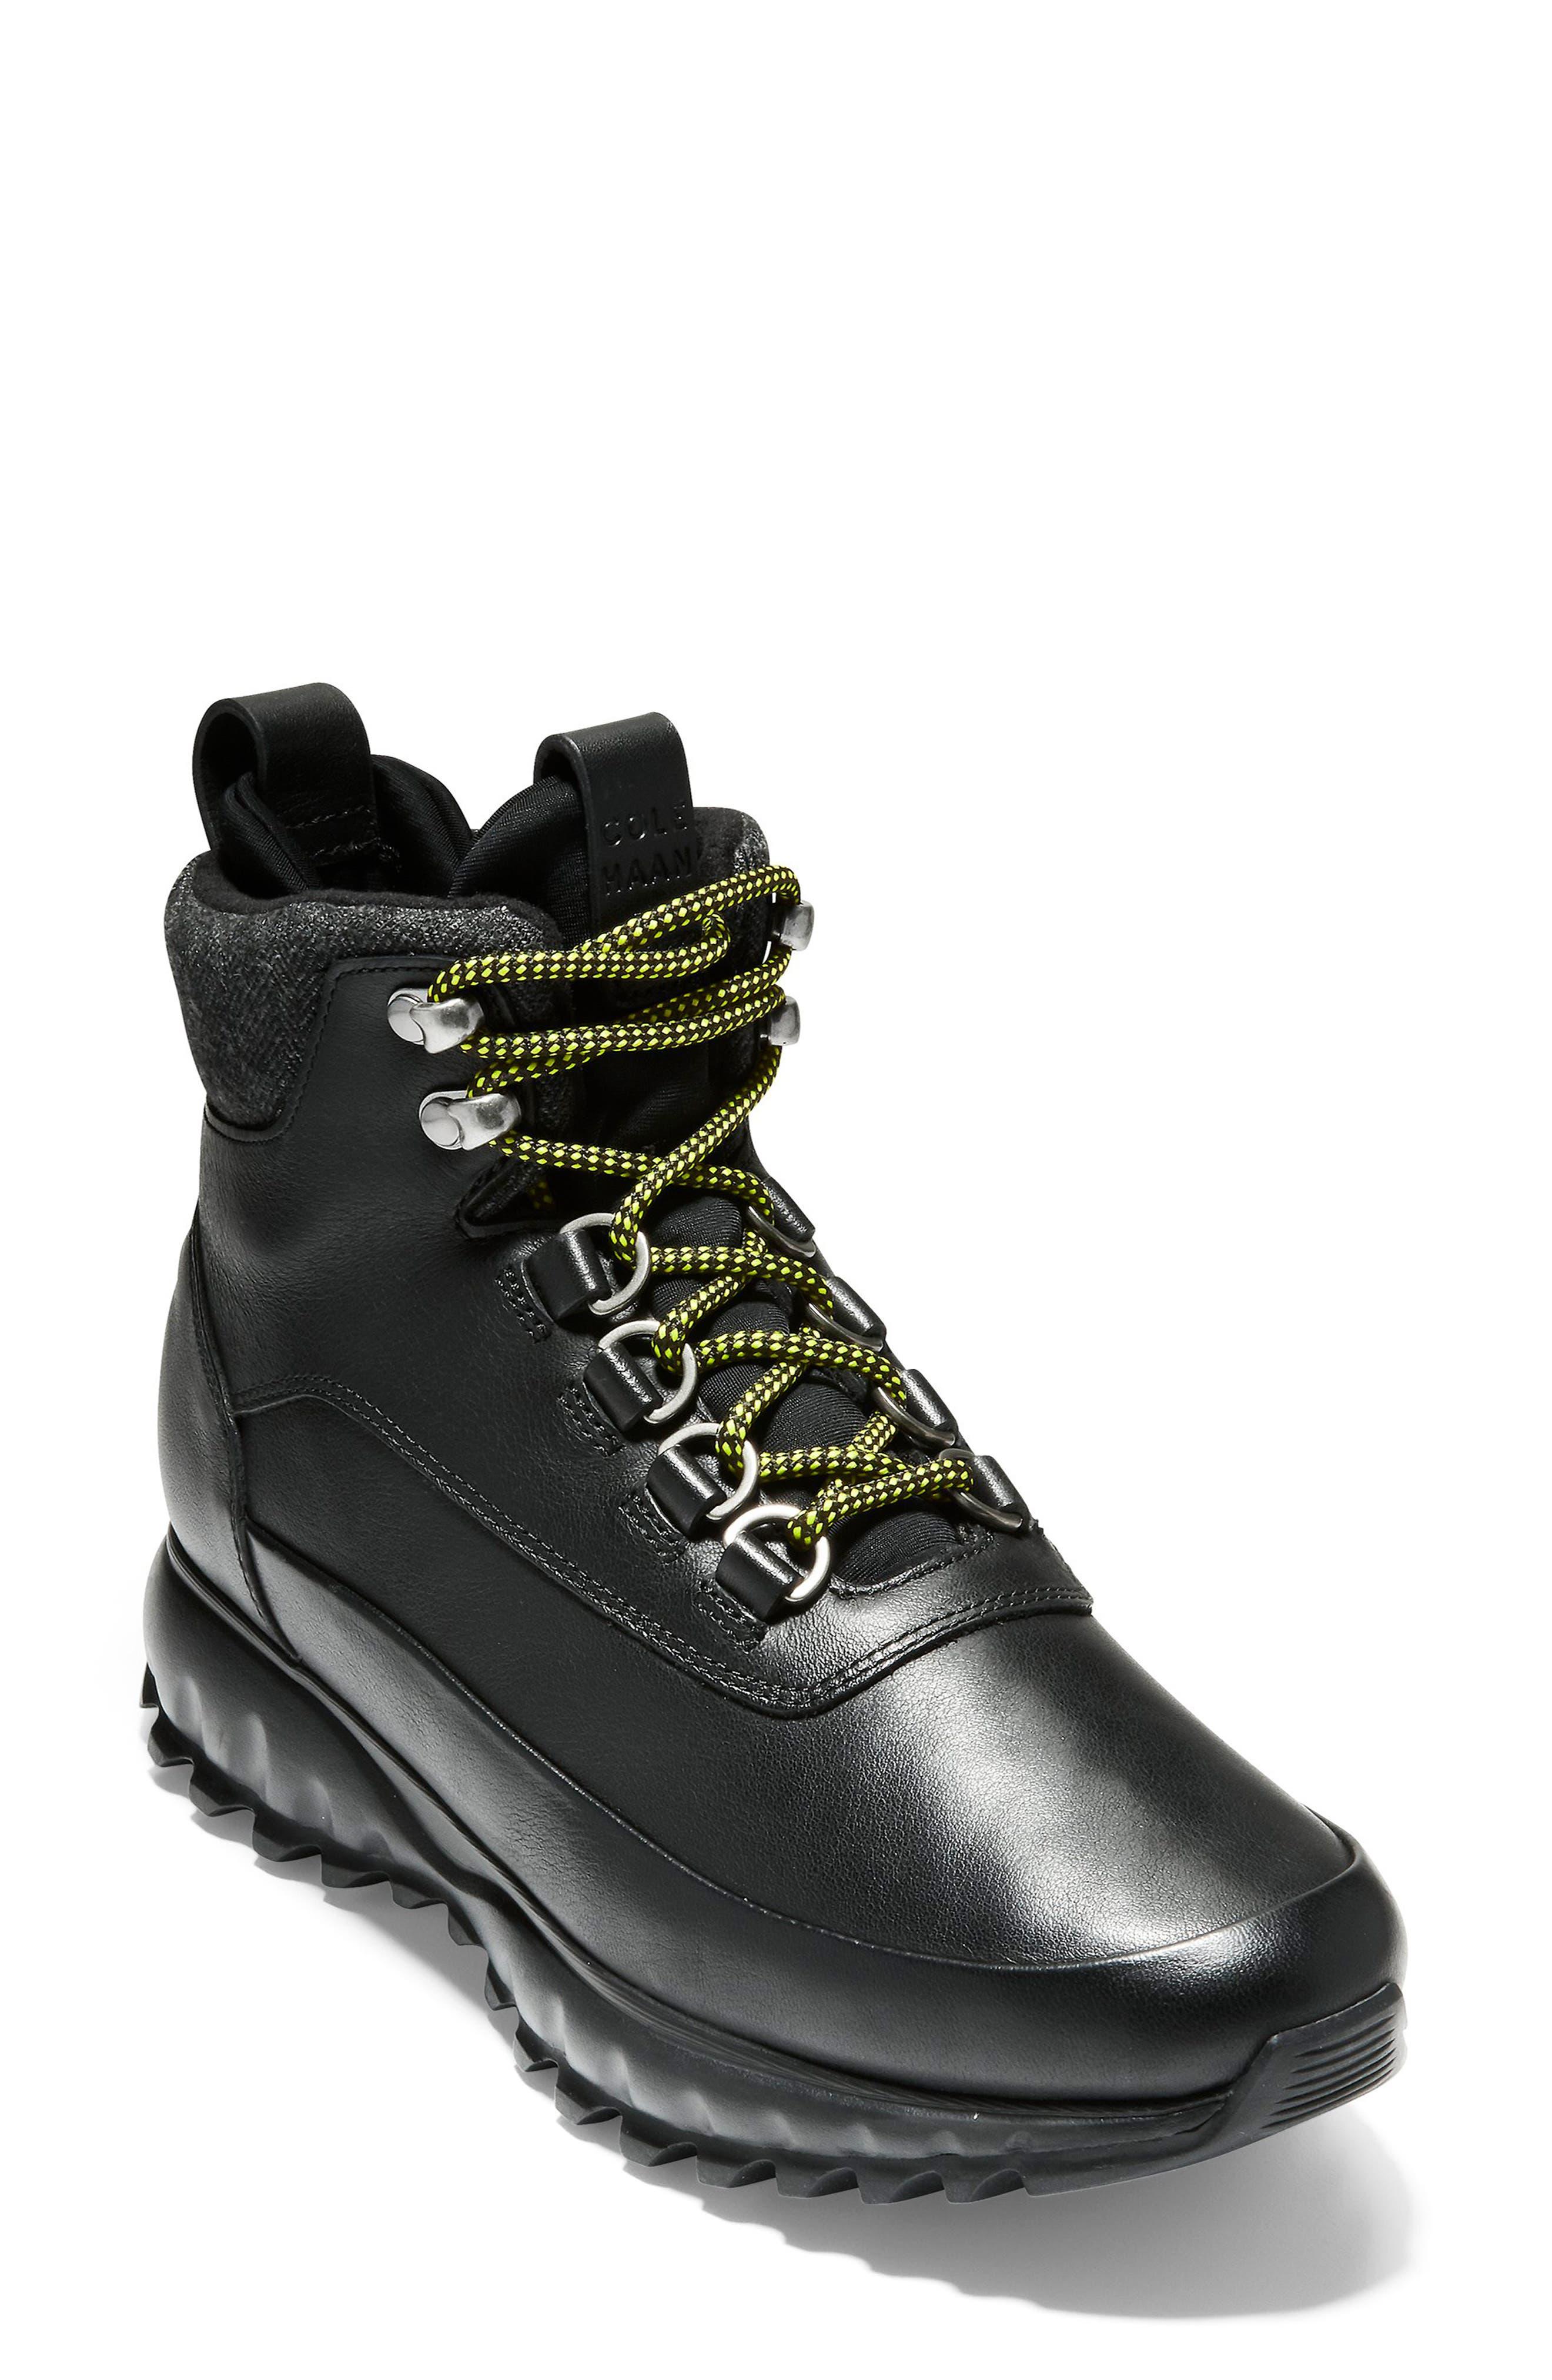 GrandExplore All Terrain Waterproof Hiking Boot,                             Main thumbnail 1, color,                             BLACK WATERPROOF LEATHER